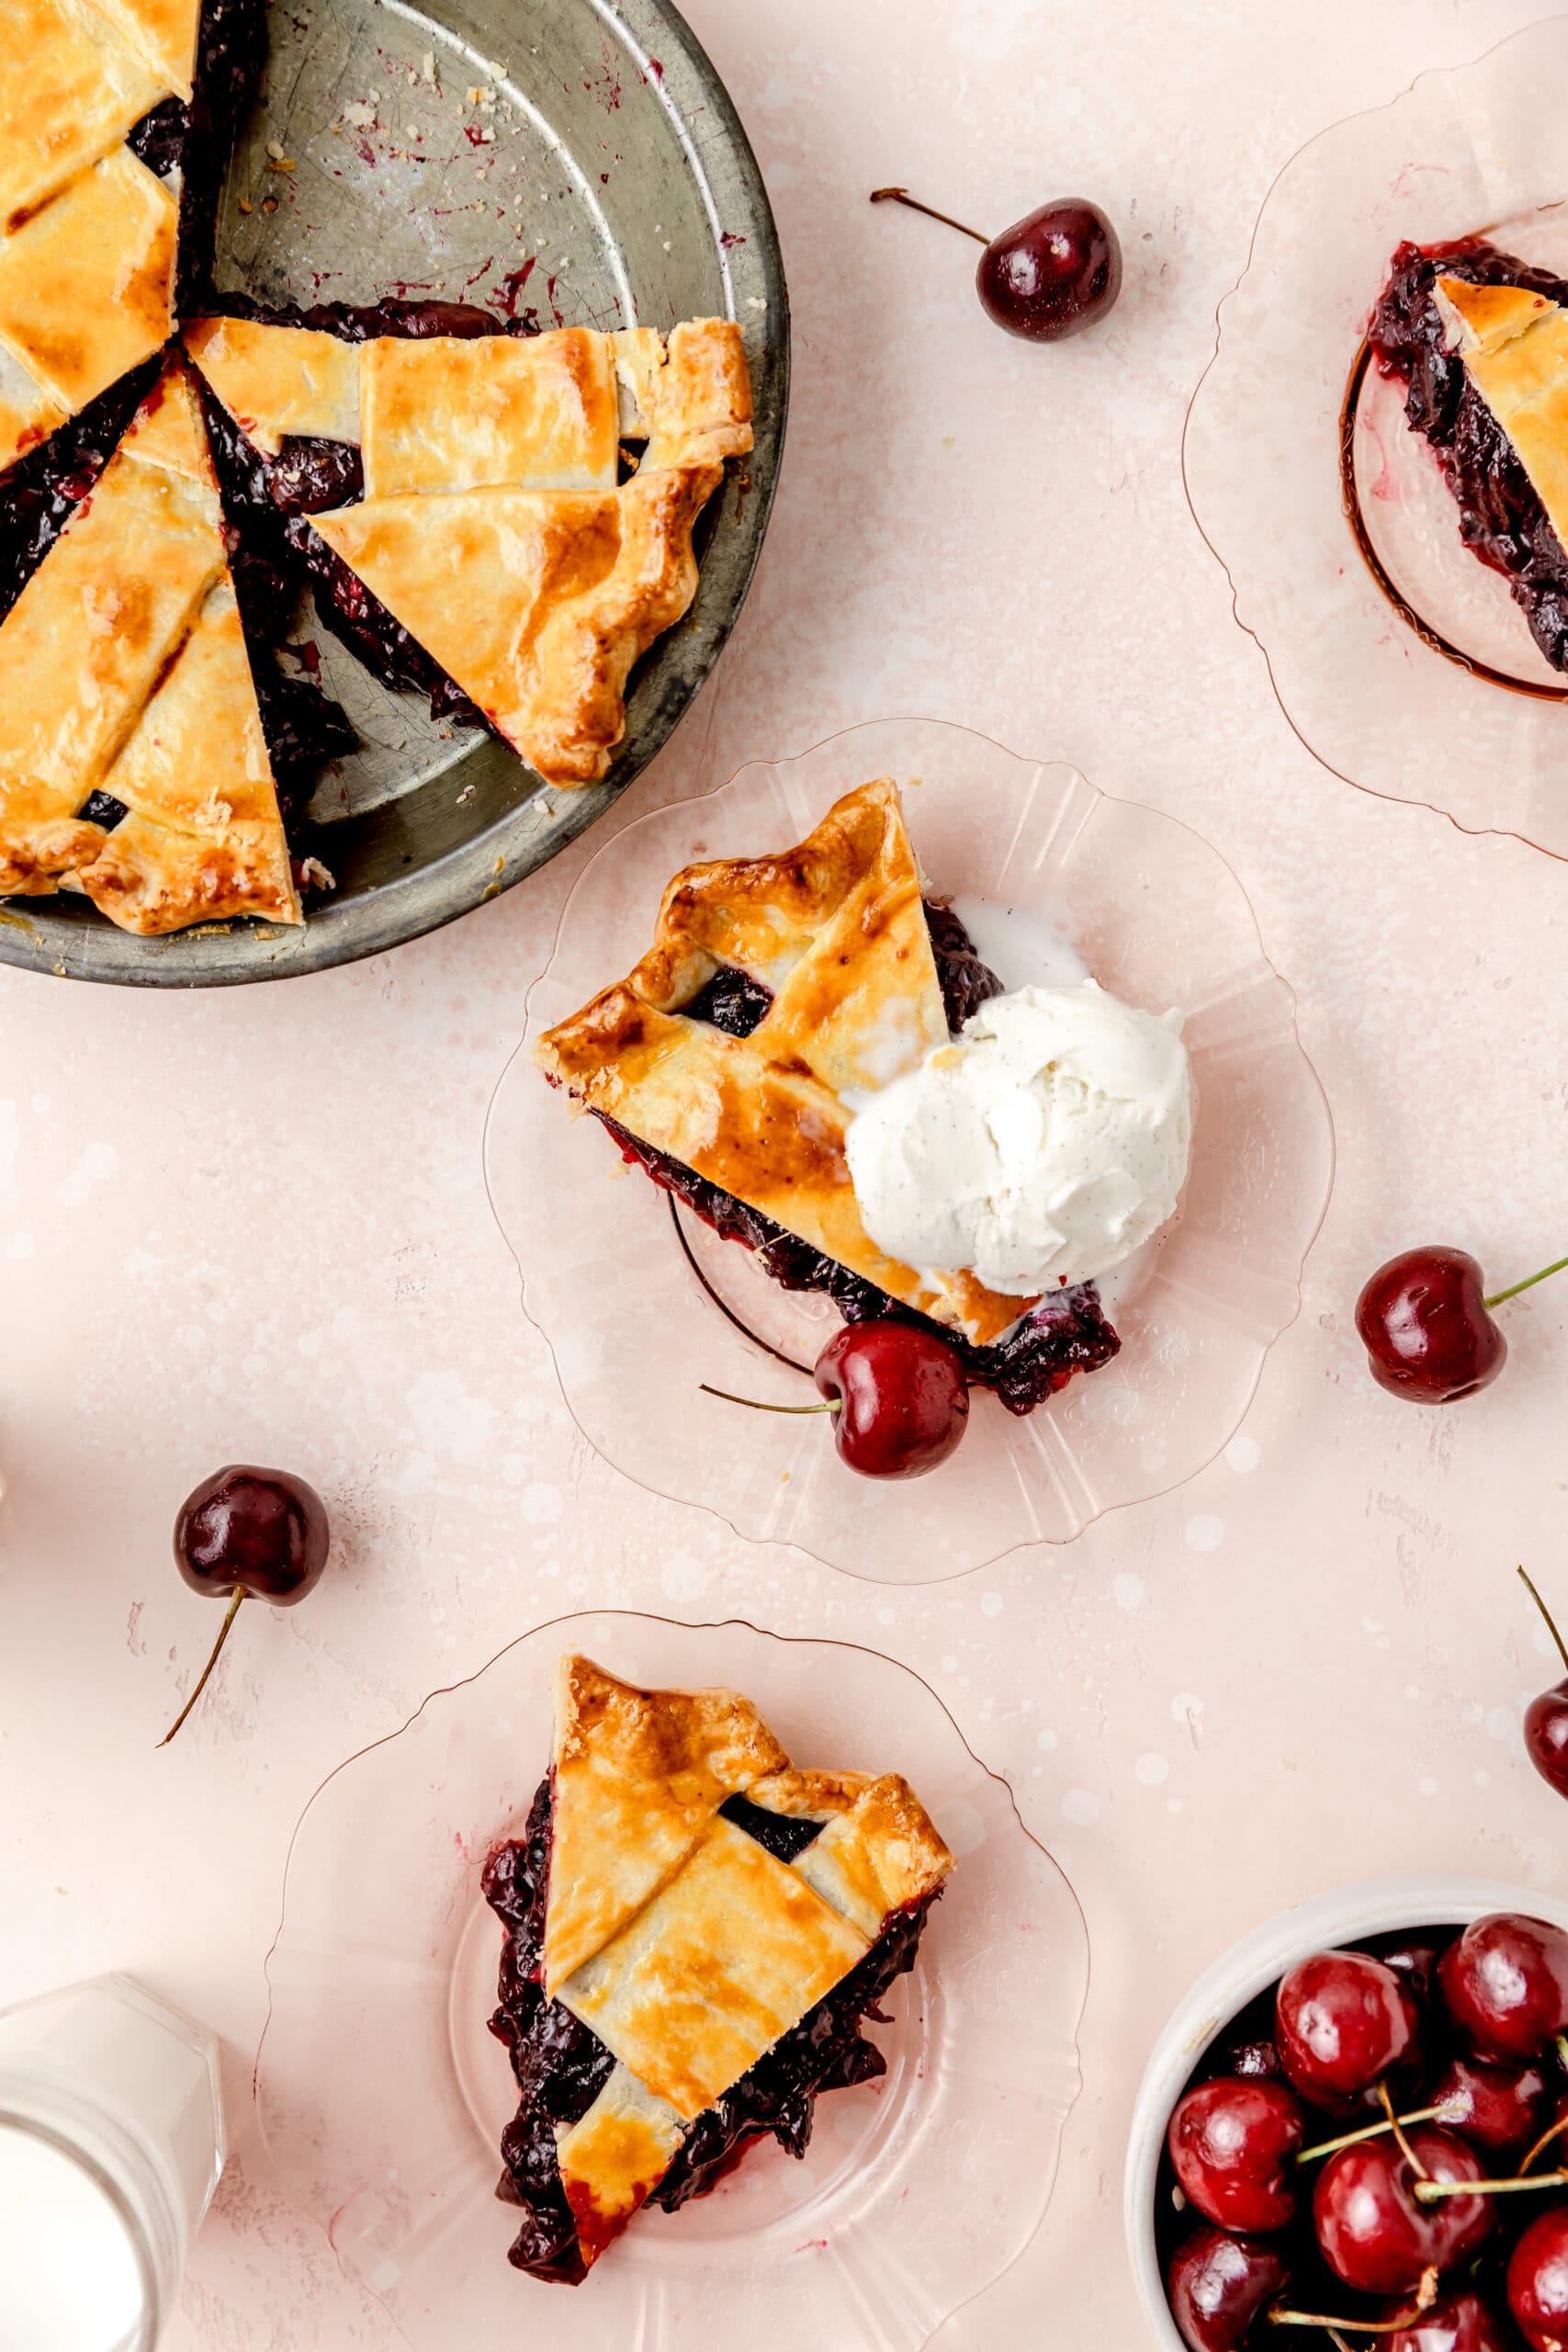 slice of cherry pie on plate topped with vanilla ice cream